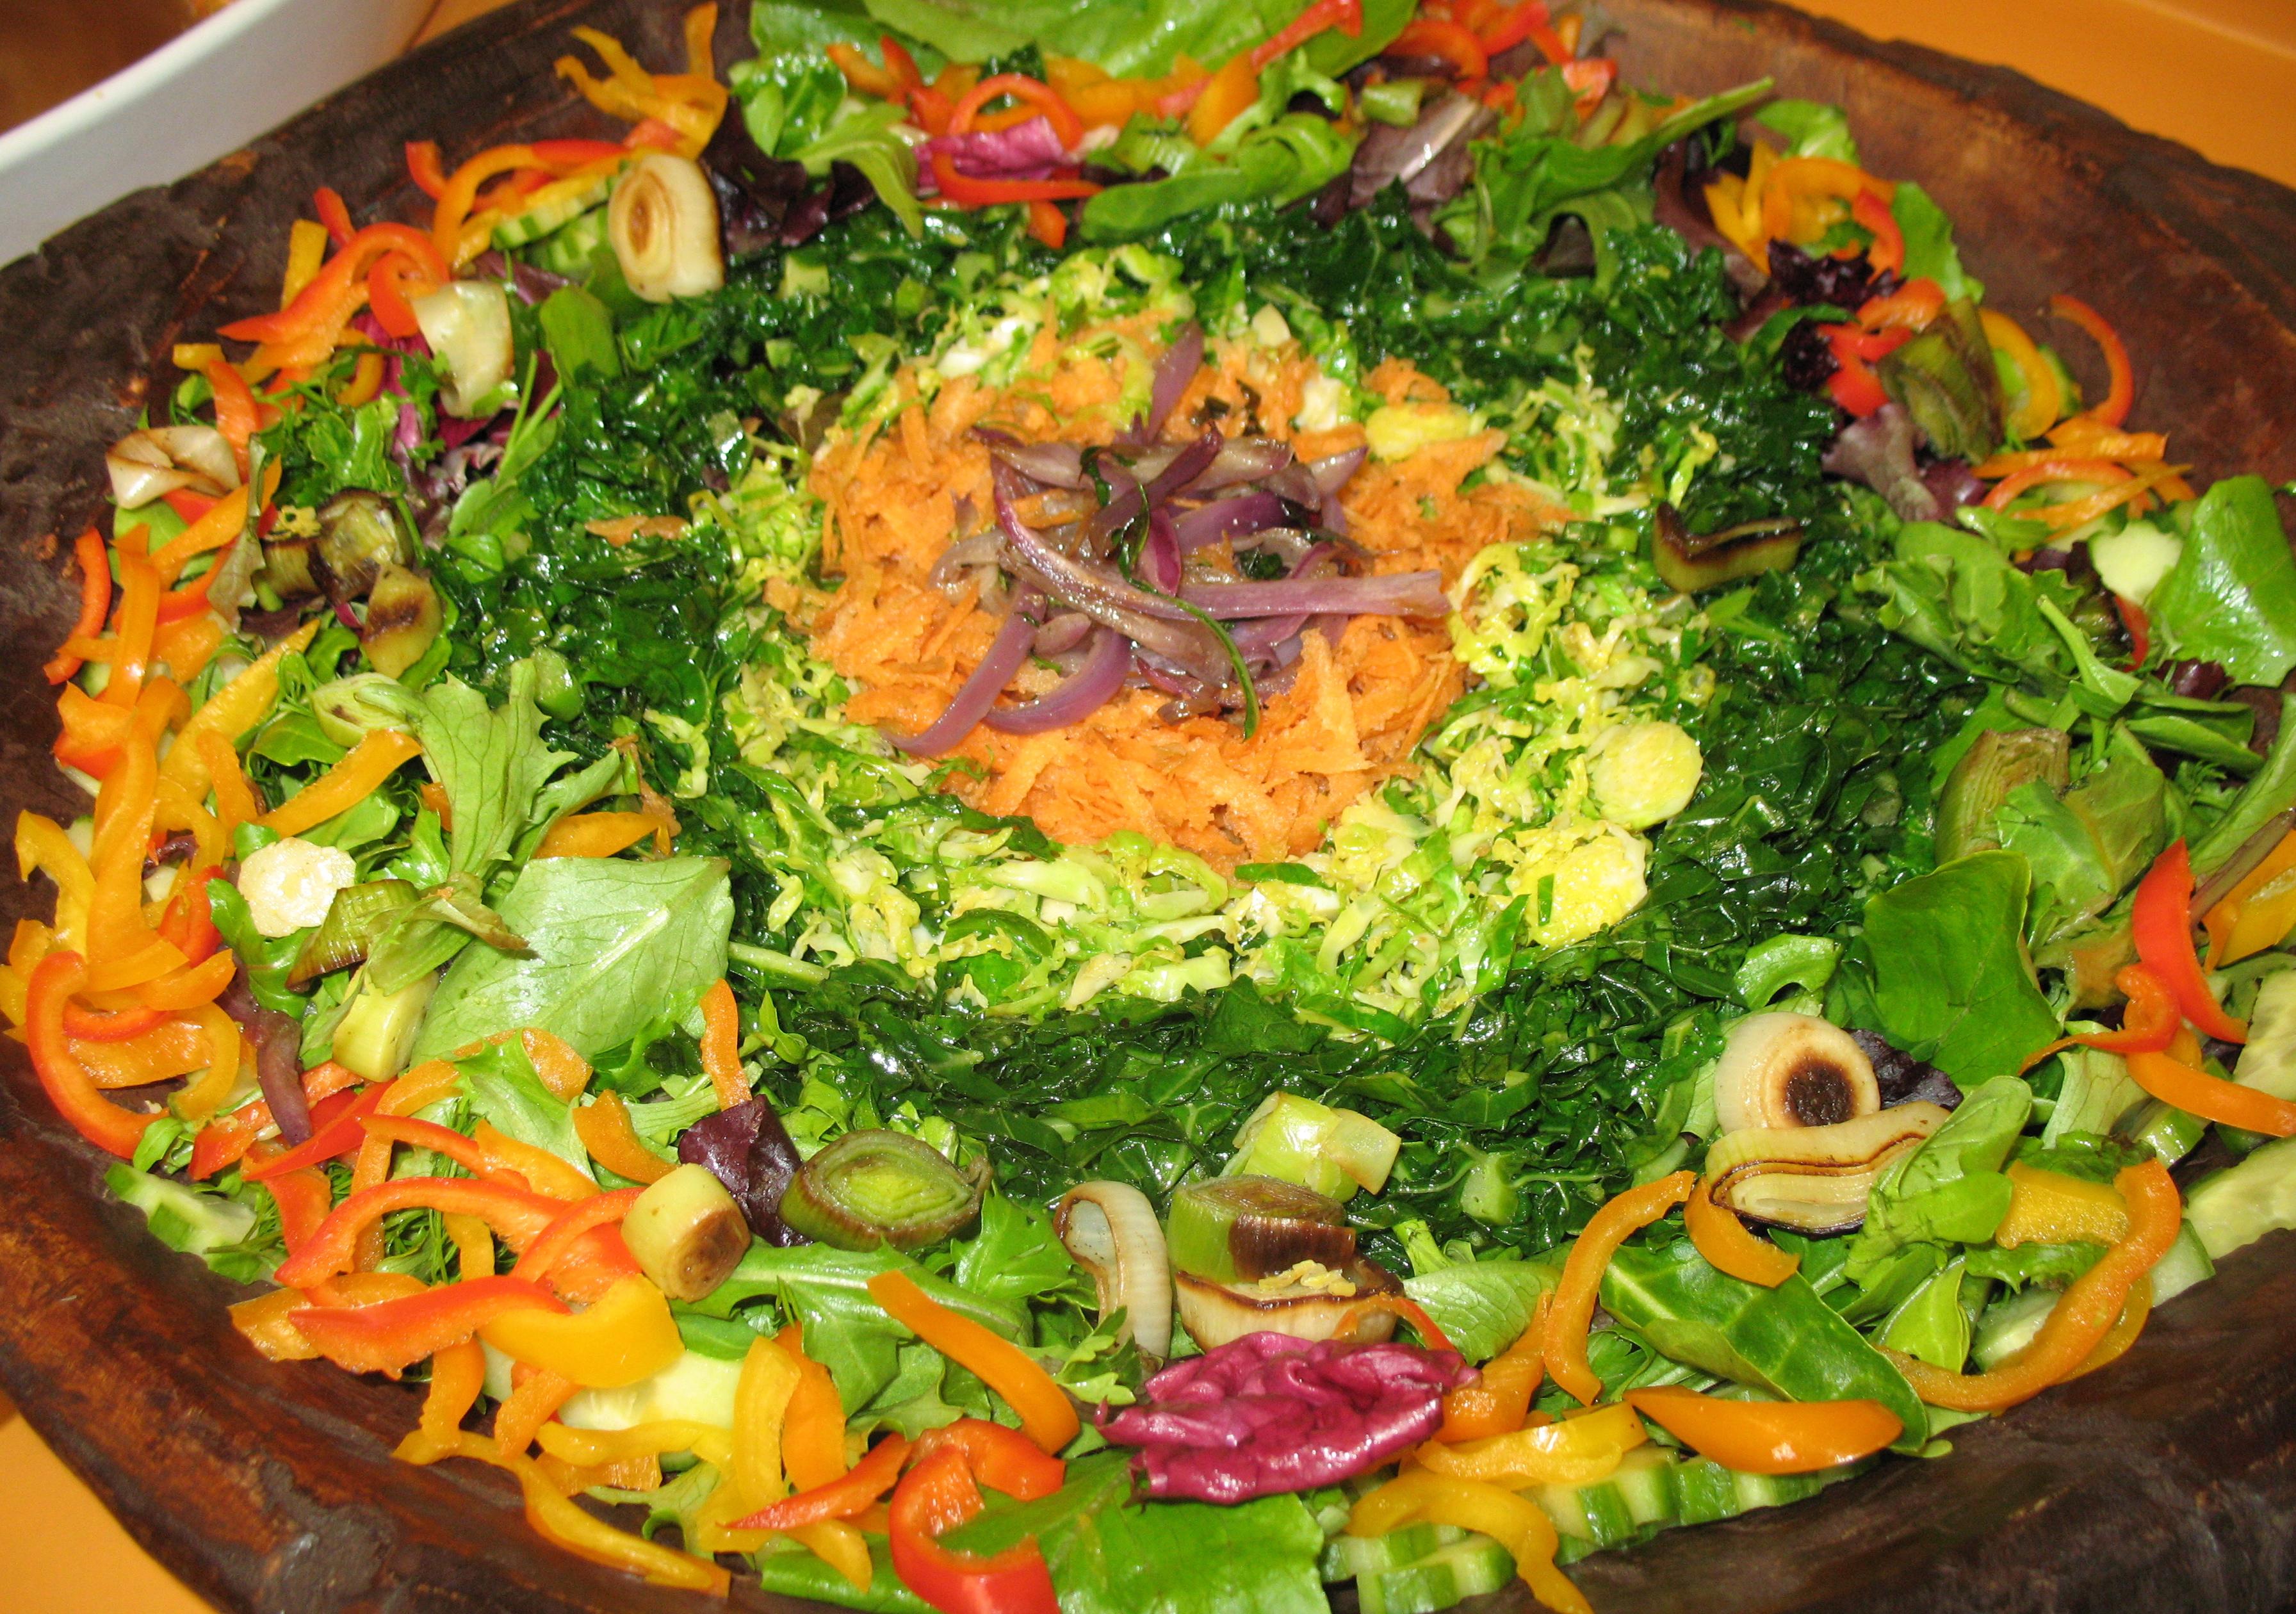 Concentric Salad